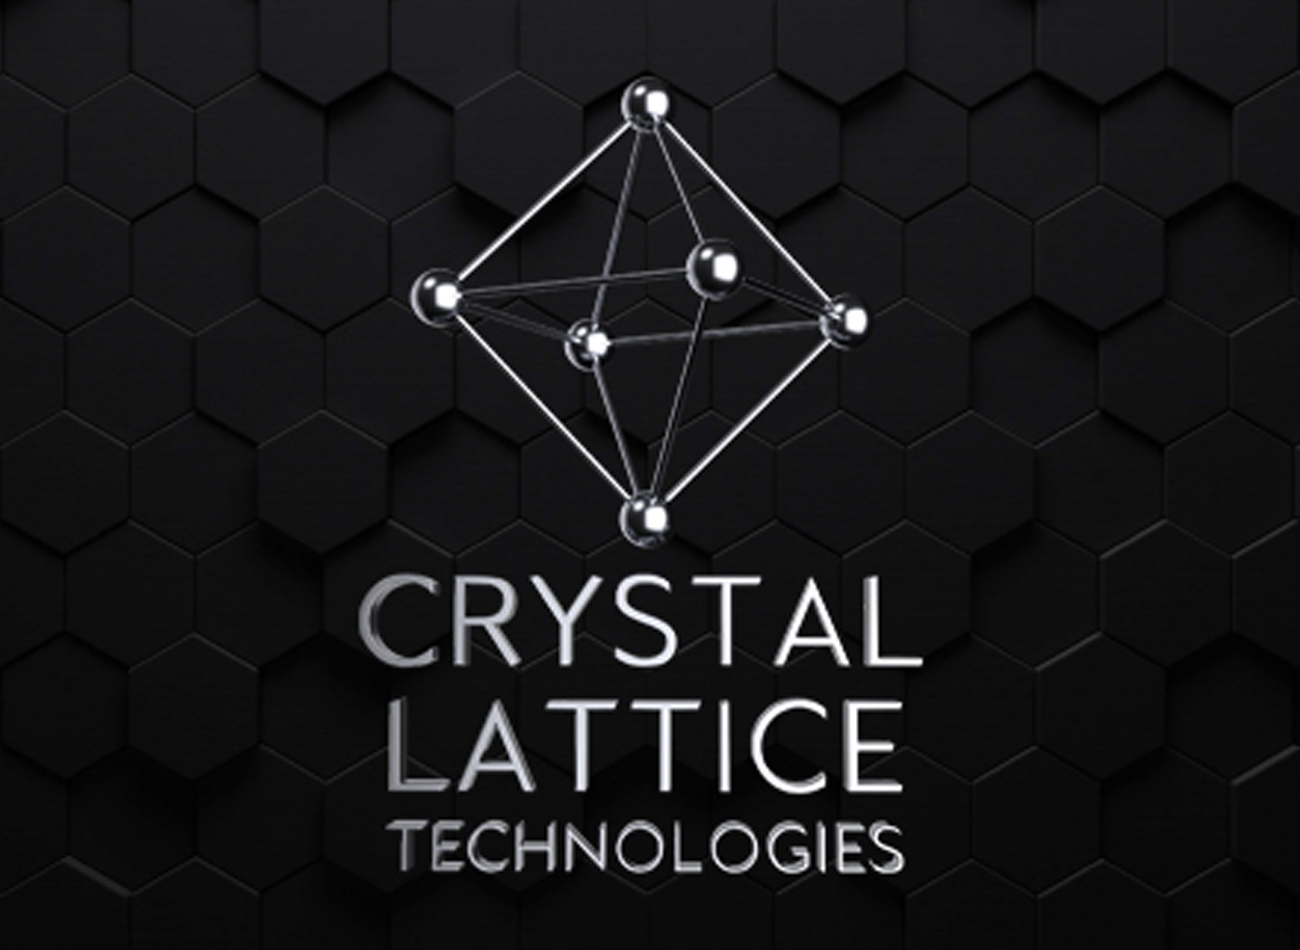 crystal-lattice-Logo-Case-Study-Corporate-Identity-Agent-Orange-Design-Thumbnail.jpg